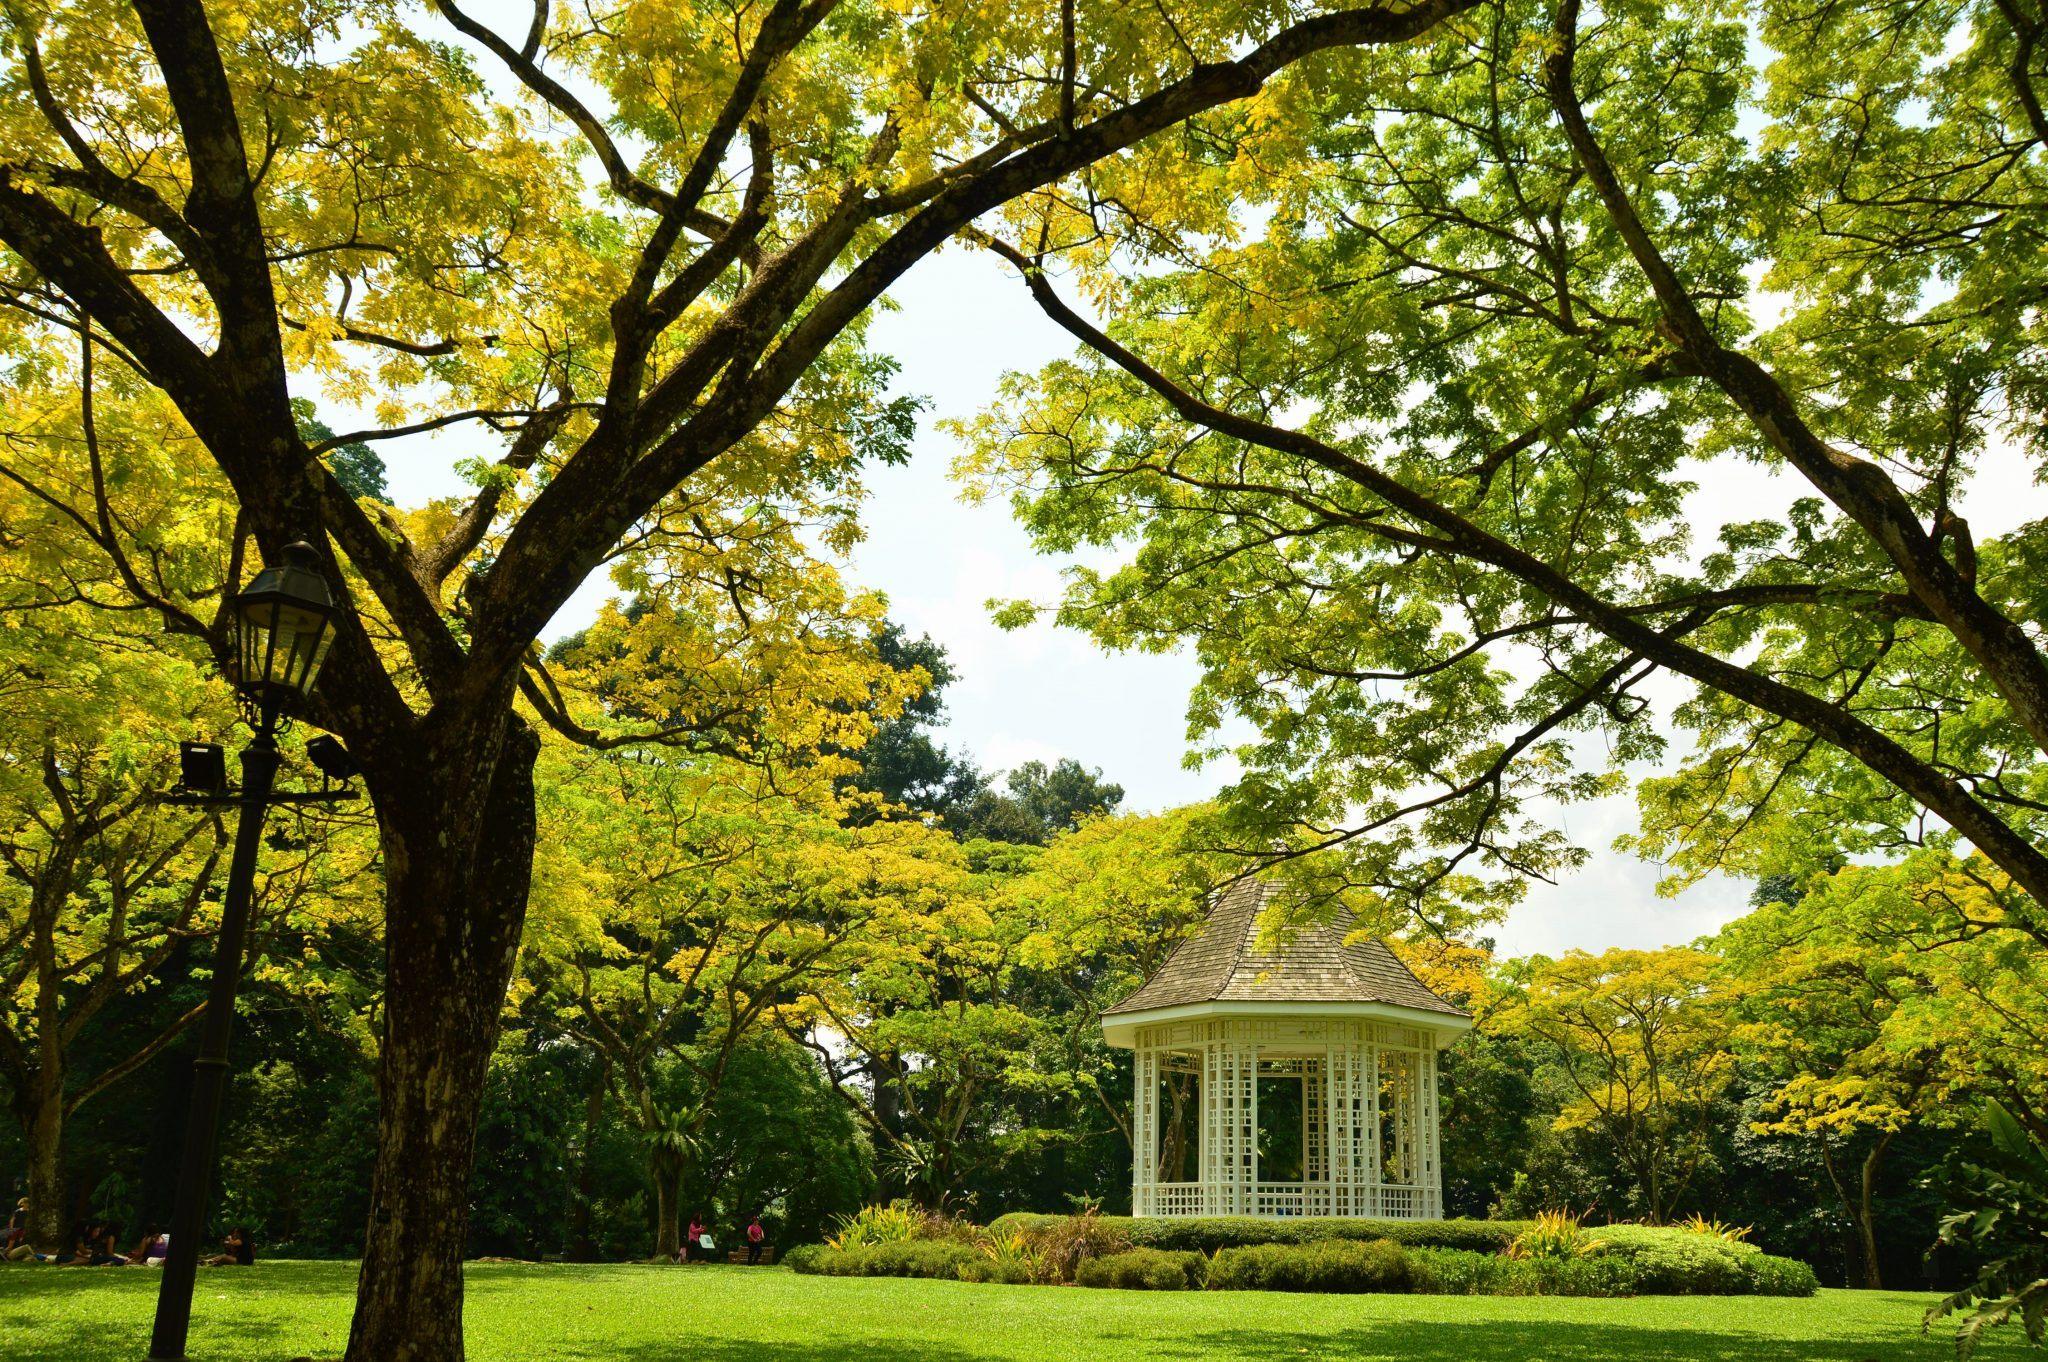 A gazebo in the Botanic Gardens of Singapore